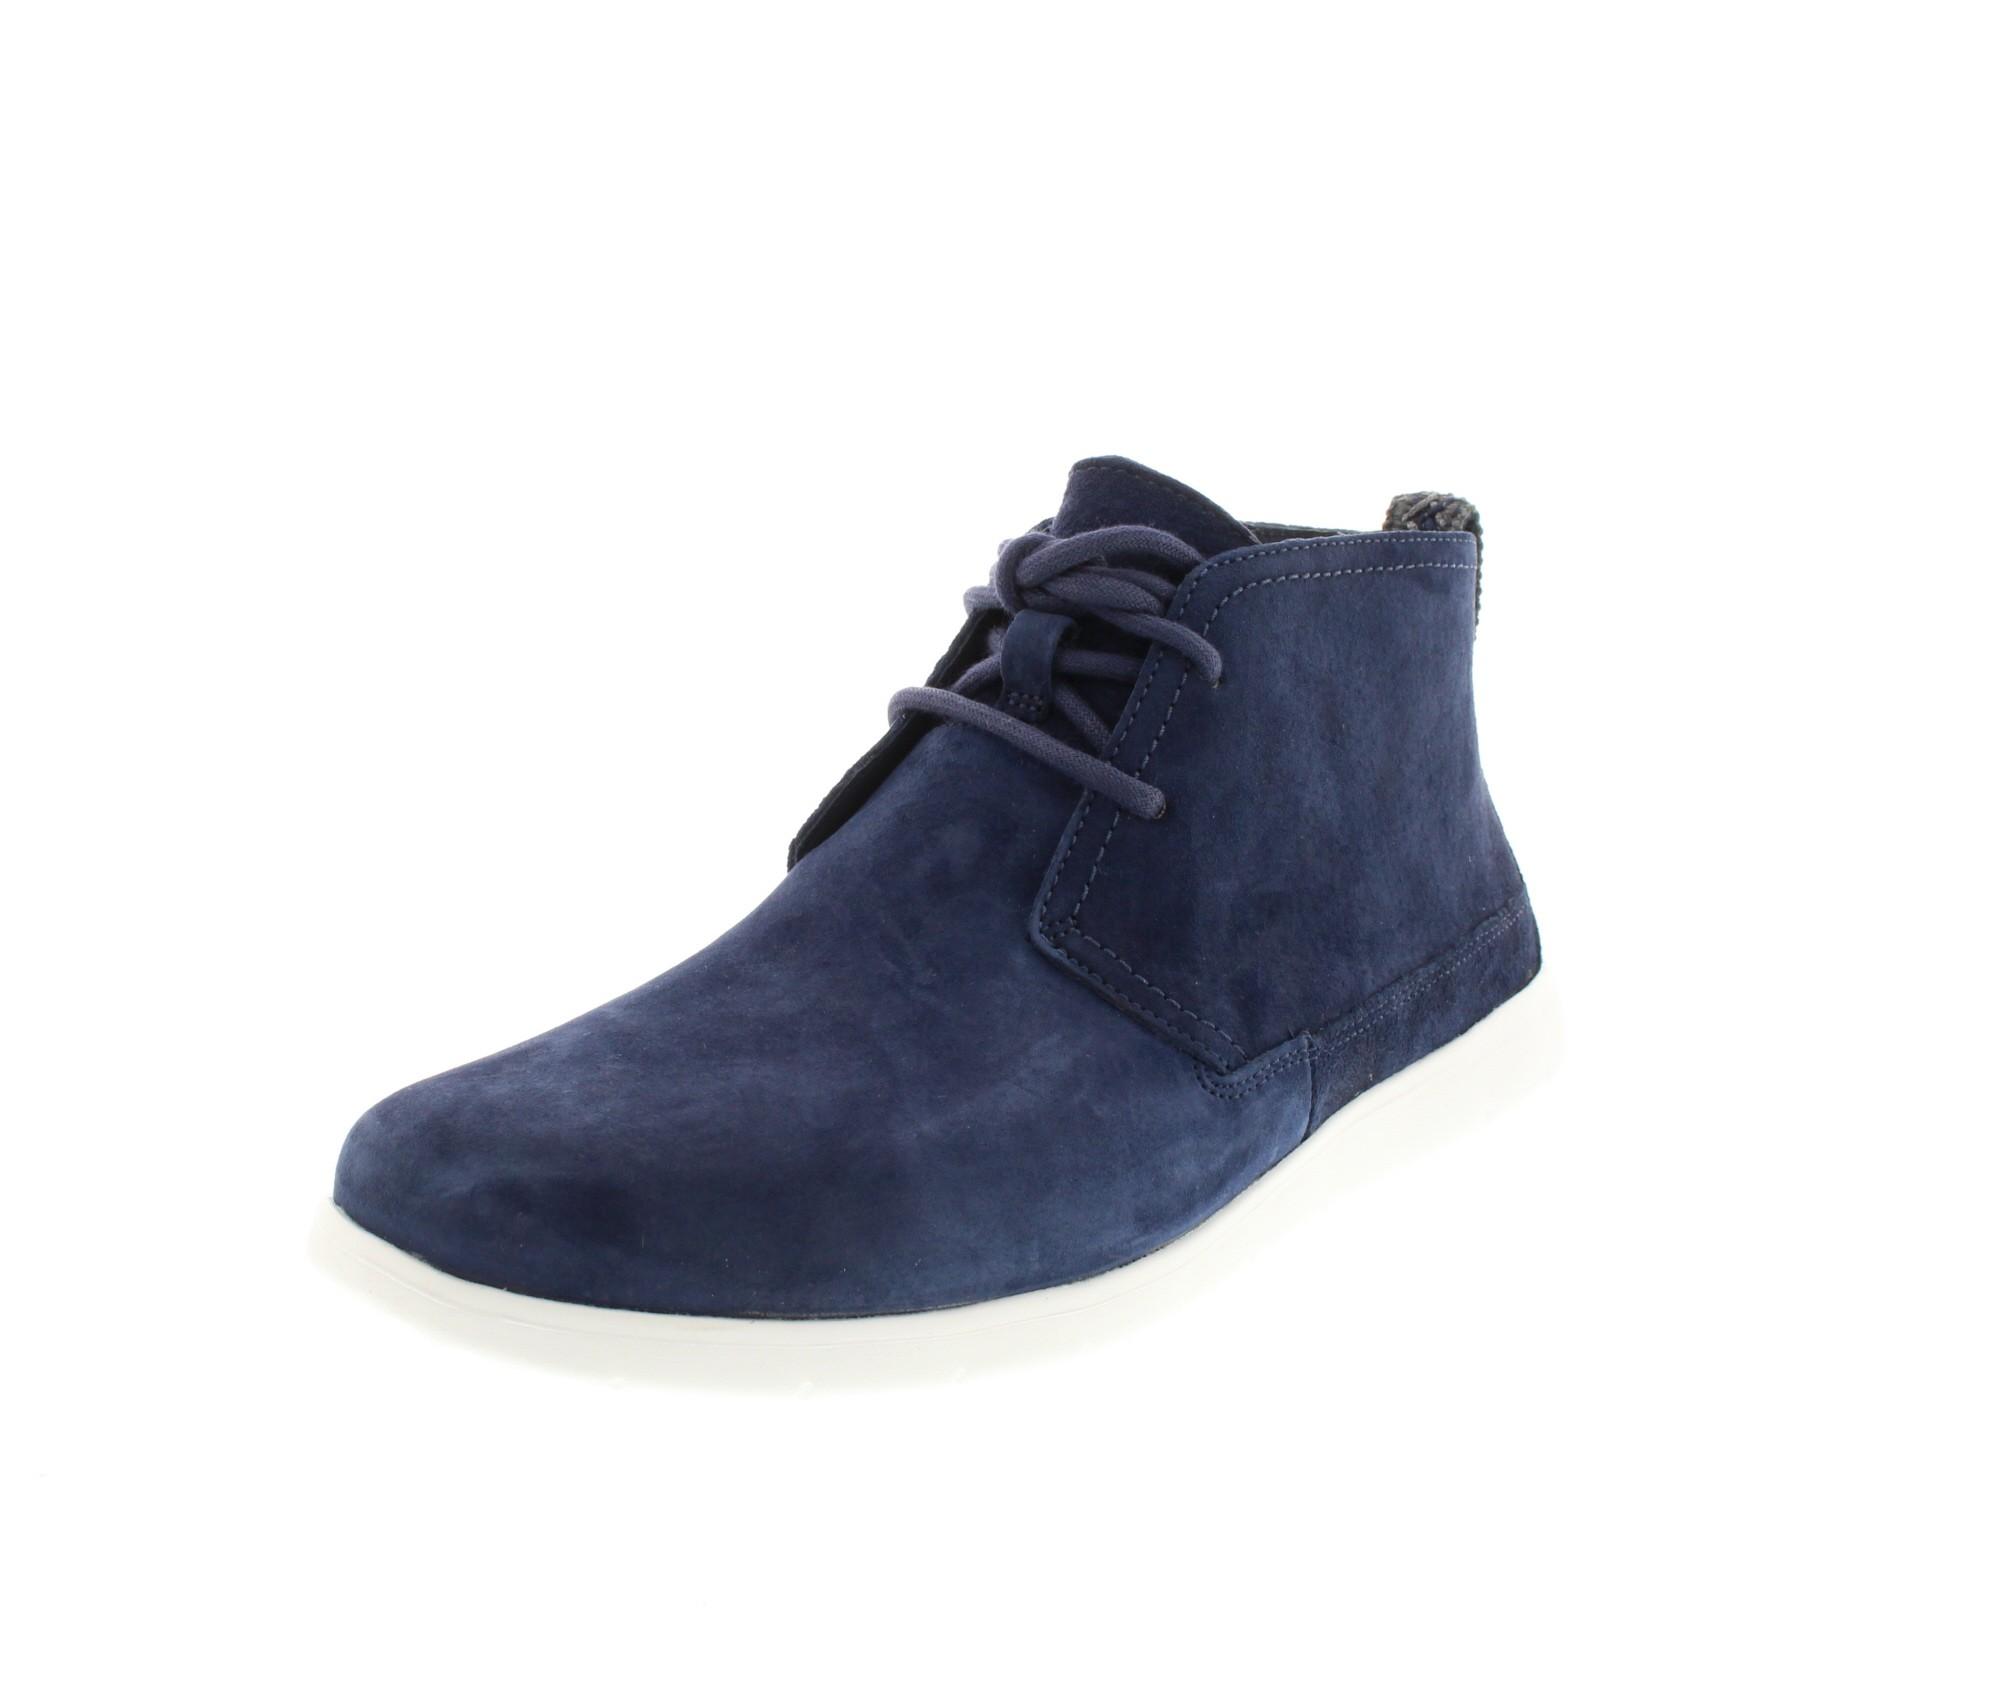 UGG Herrenschuhe - Sneaker FREAMON - new navy-0